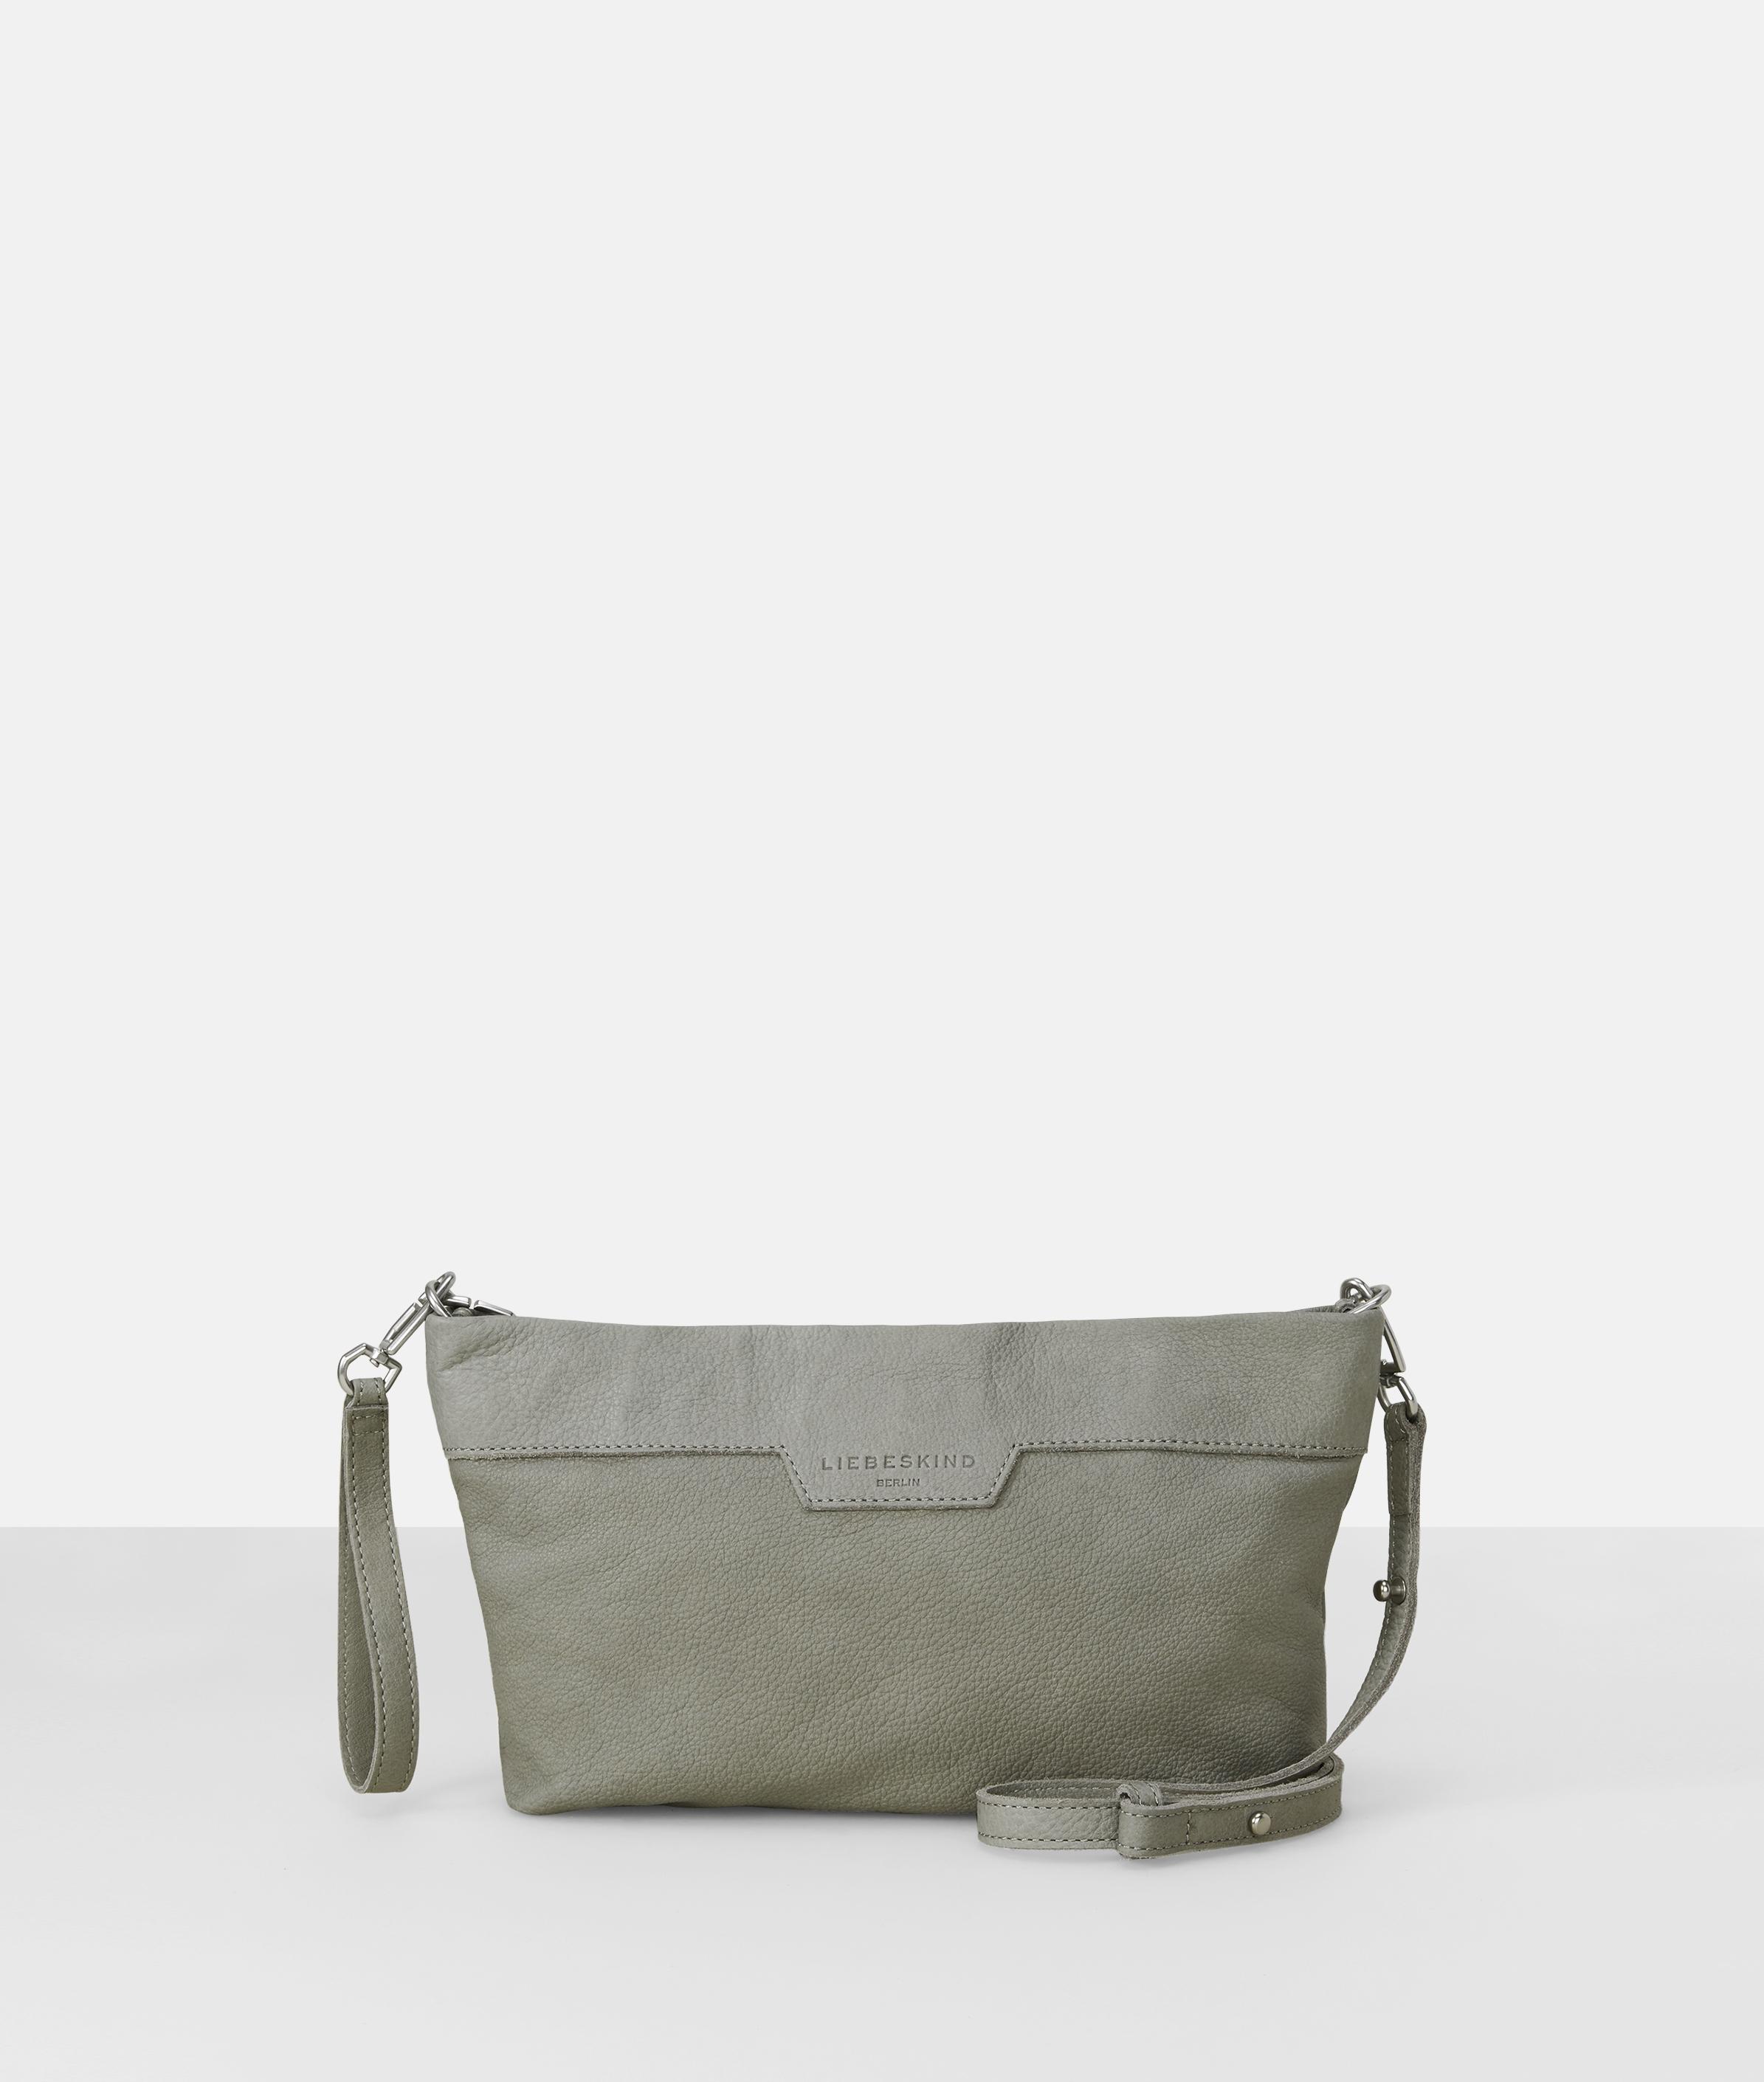 Berlin Tasche Carrie 7, Grau/Schwarz